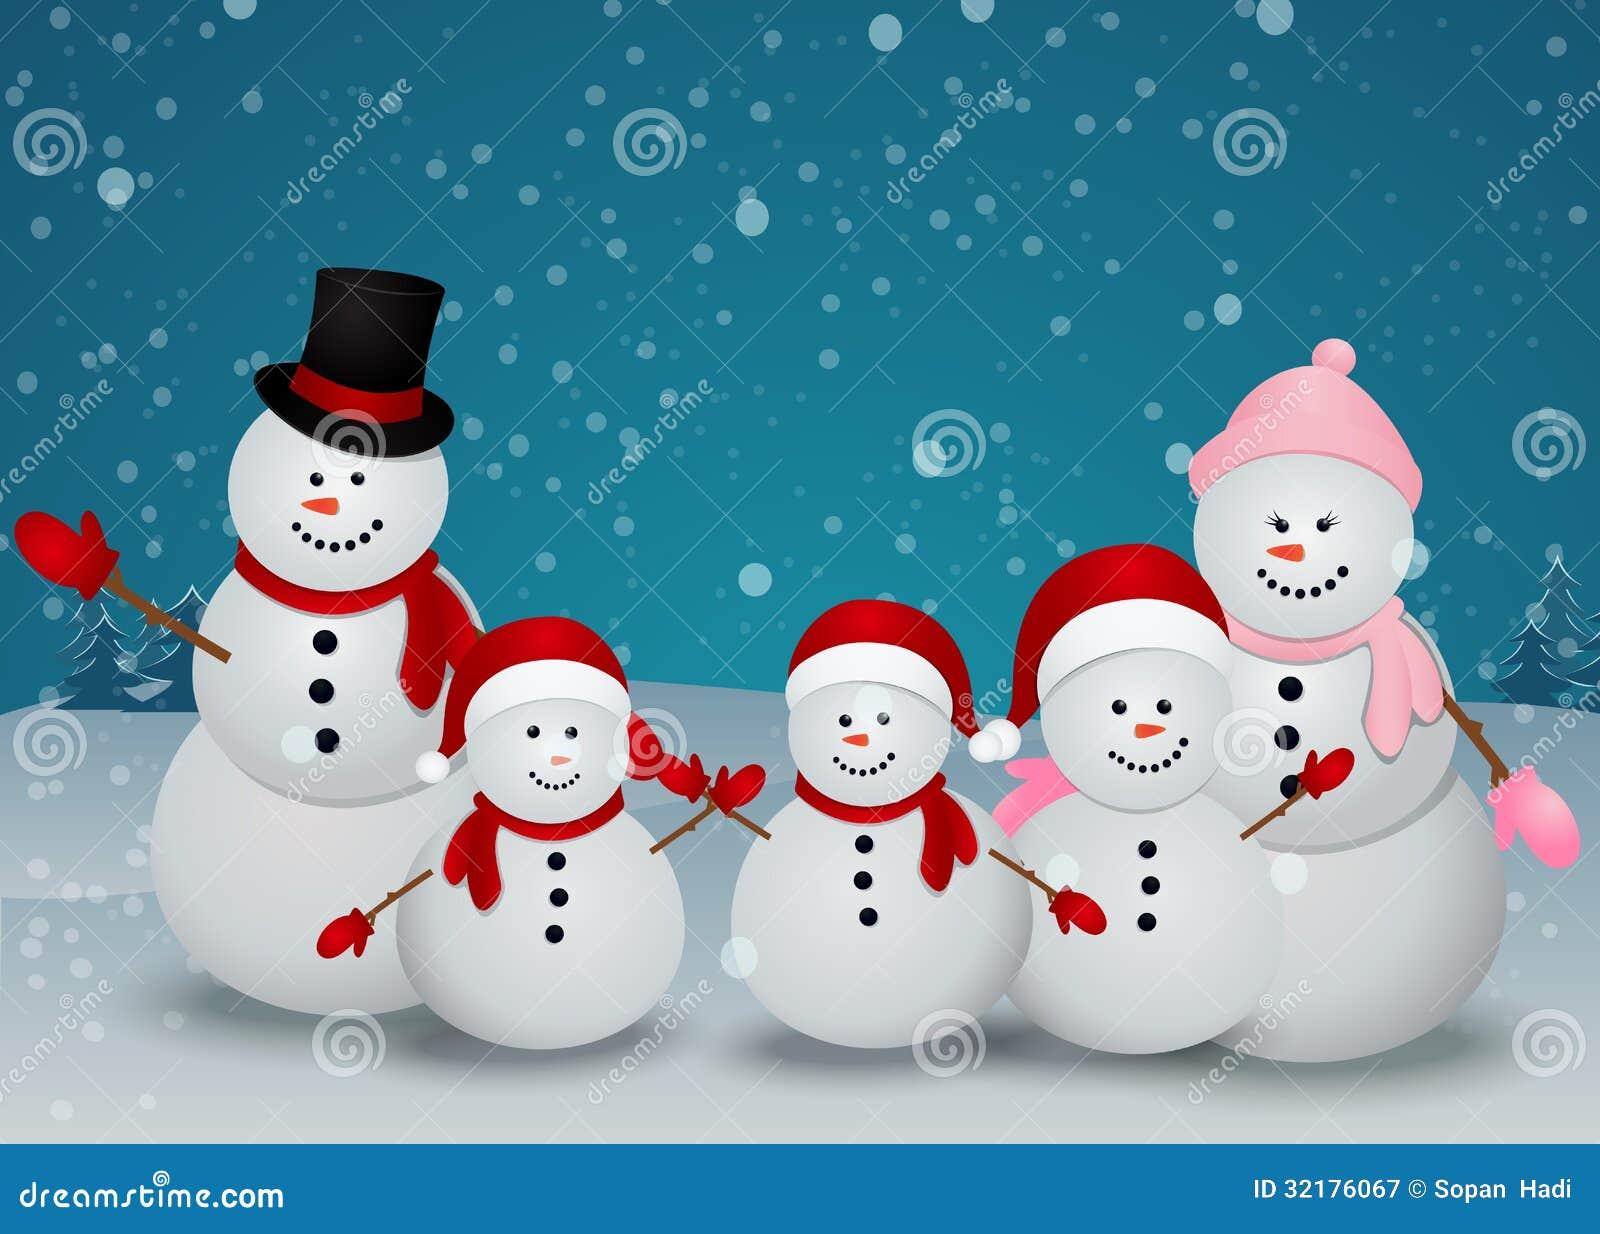 snowman family clip art free - photo #49